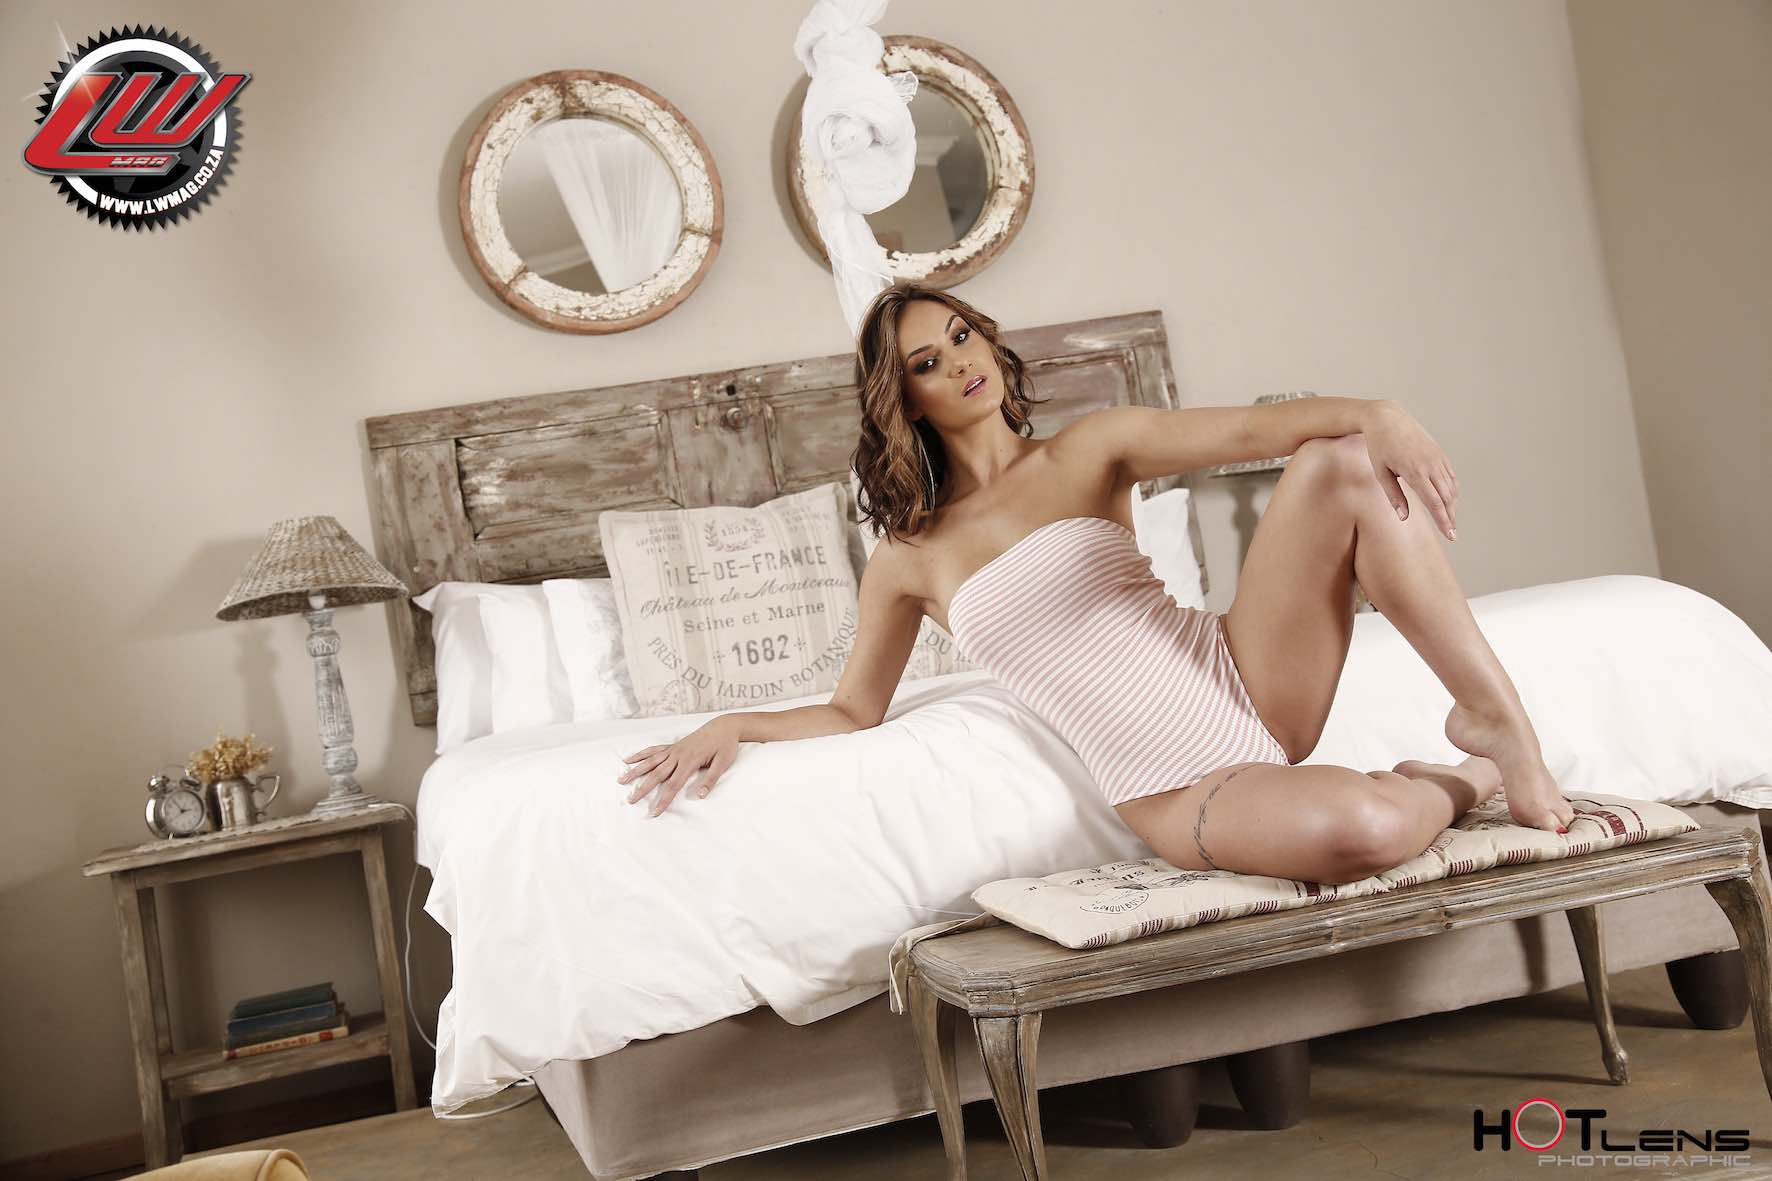 Meet Charne Botha as this week's LW Babe